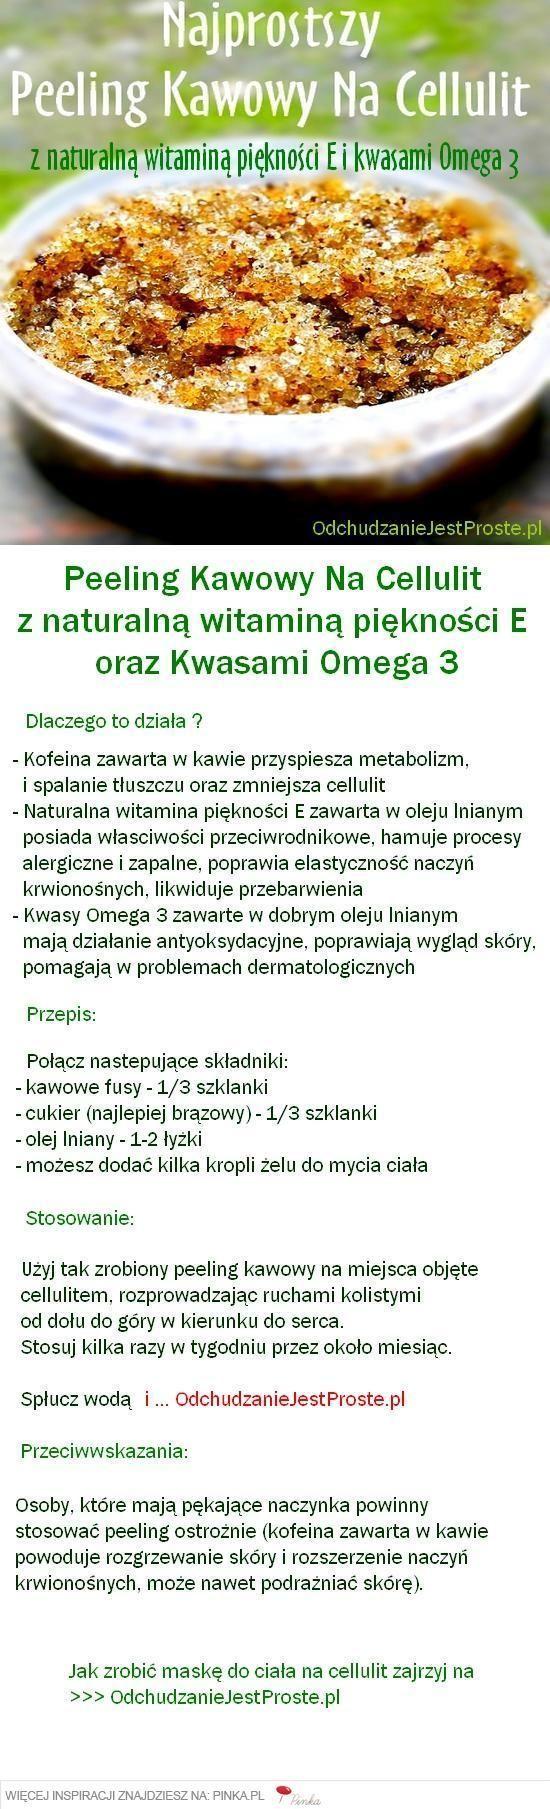 Peeling Kawowy na cellulit: